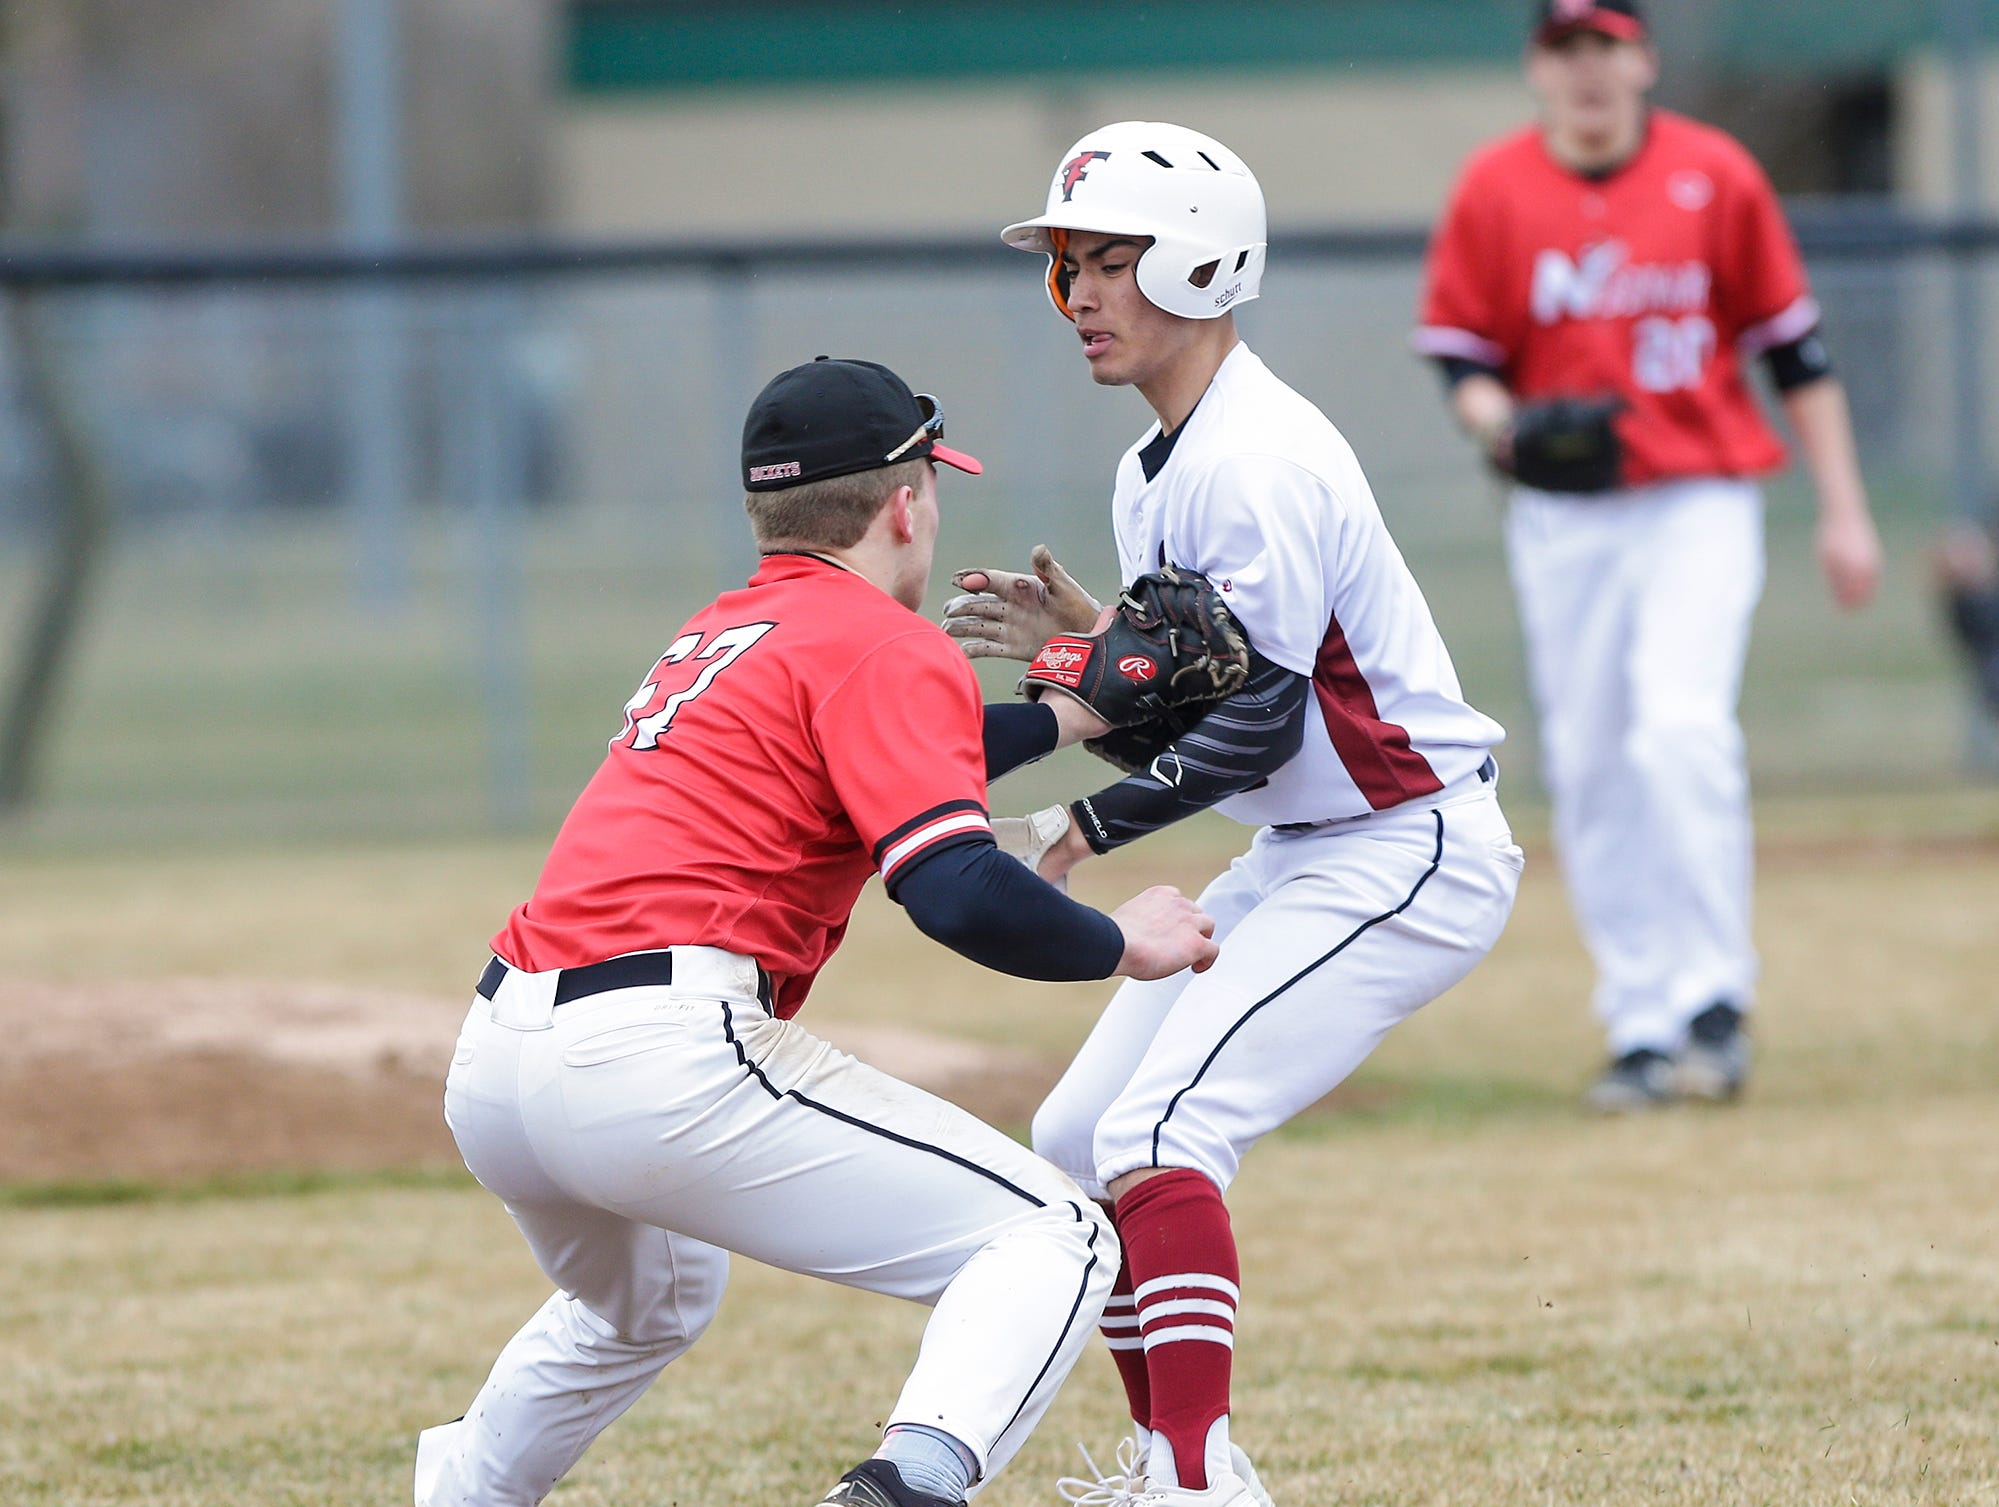 Neenah High School baseball's Logan Eiden picks off Fond du Lac High School's Julian Murillo at first base during their game Thursday, April 18, 2019 in Fond du Lac, Wis. Doug Raflik/USA TODAY NETWORK-Wisconsin